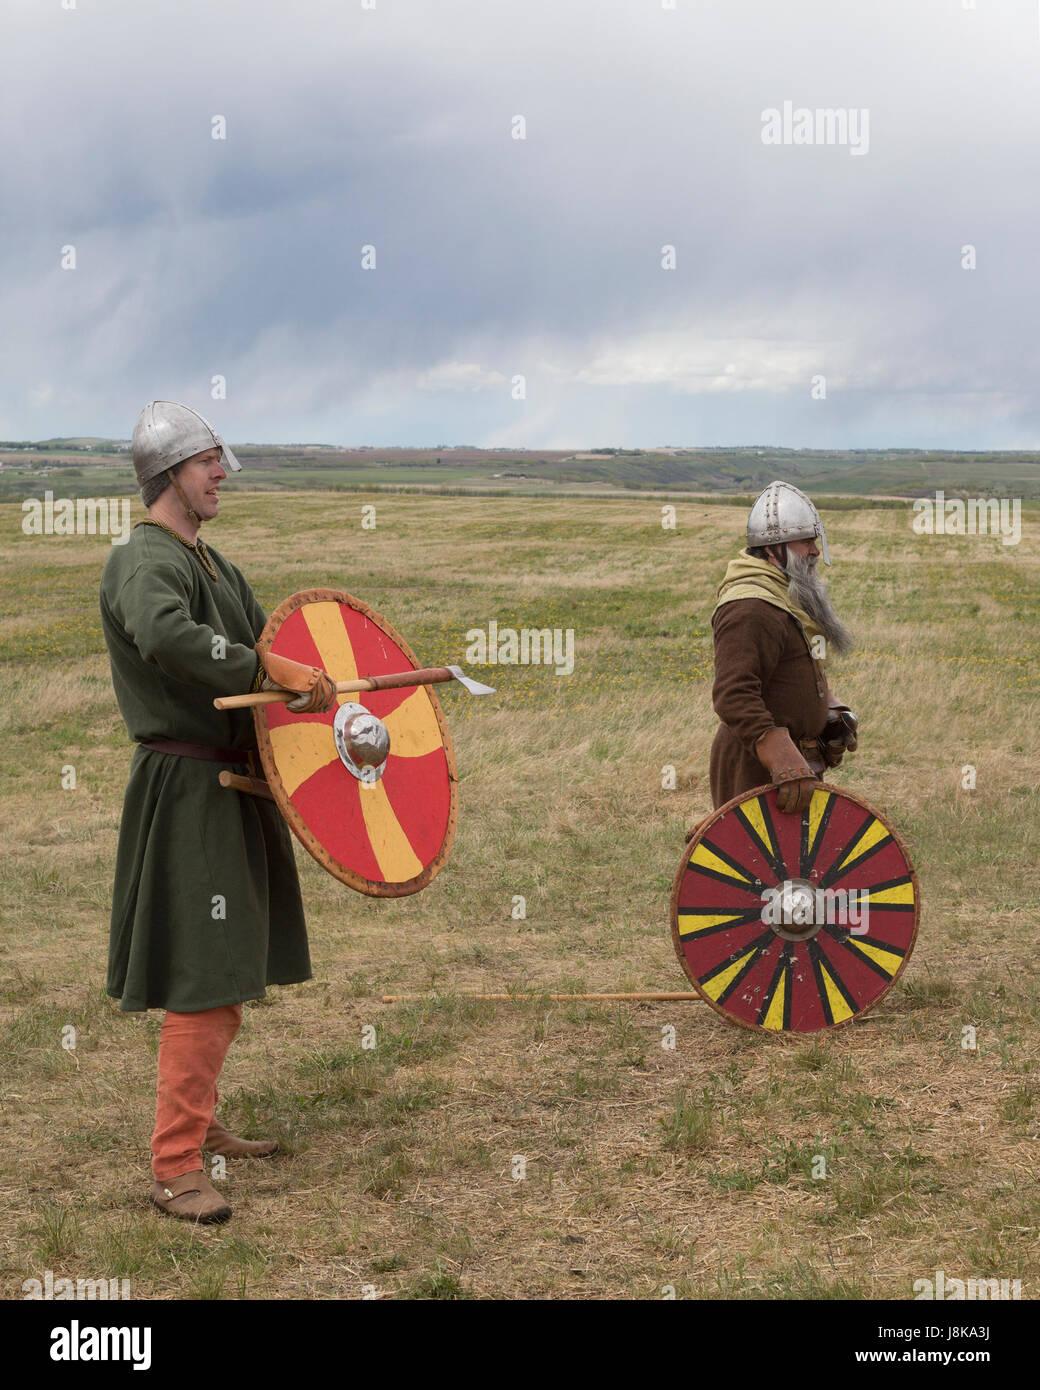 Men wearing traditional Viking warrior costumes during battle reenactment - Stock Image